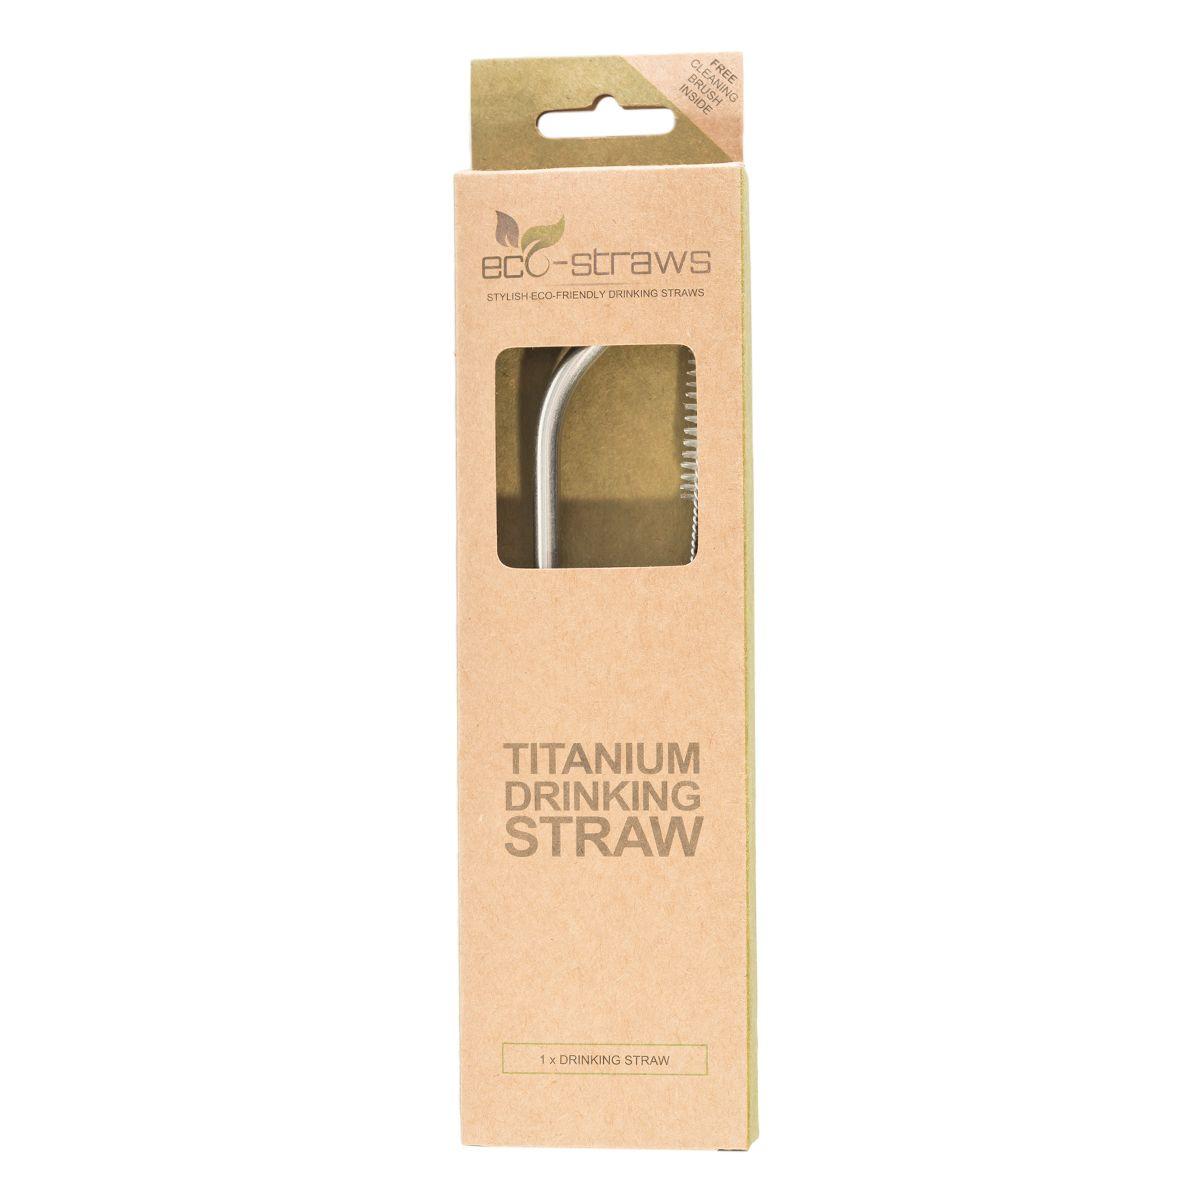 TITANIUM Drinking Straw (STRAIGHT)